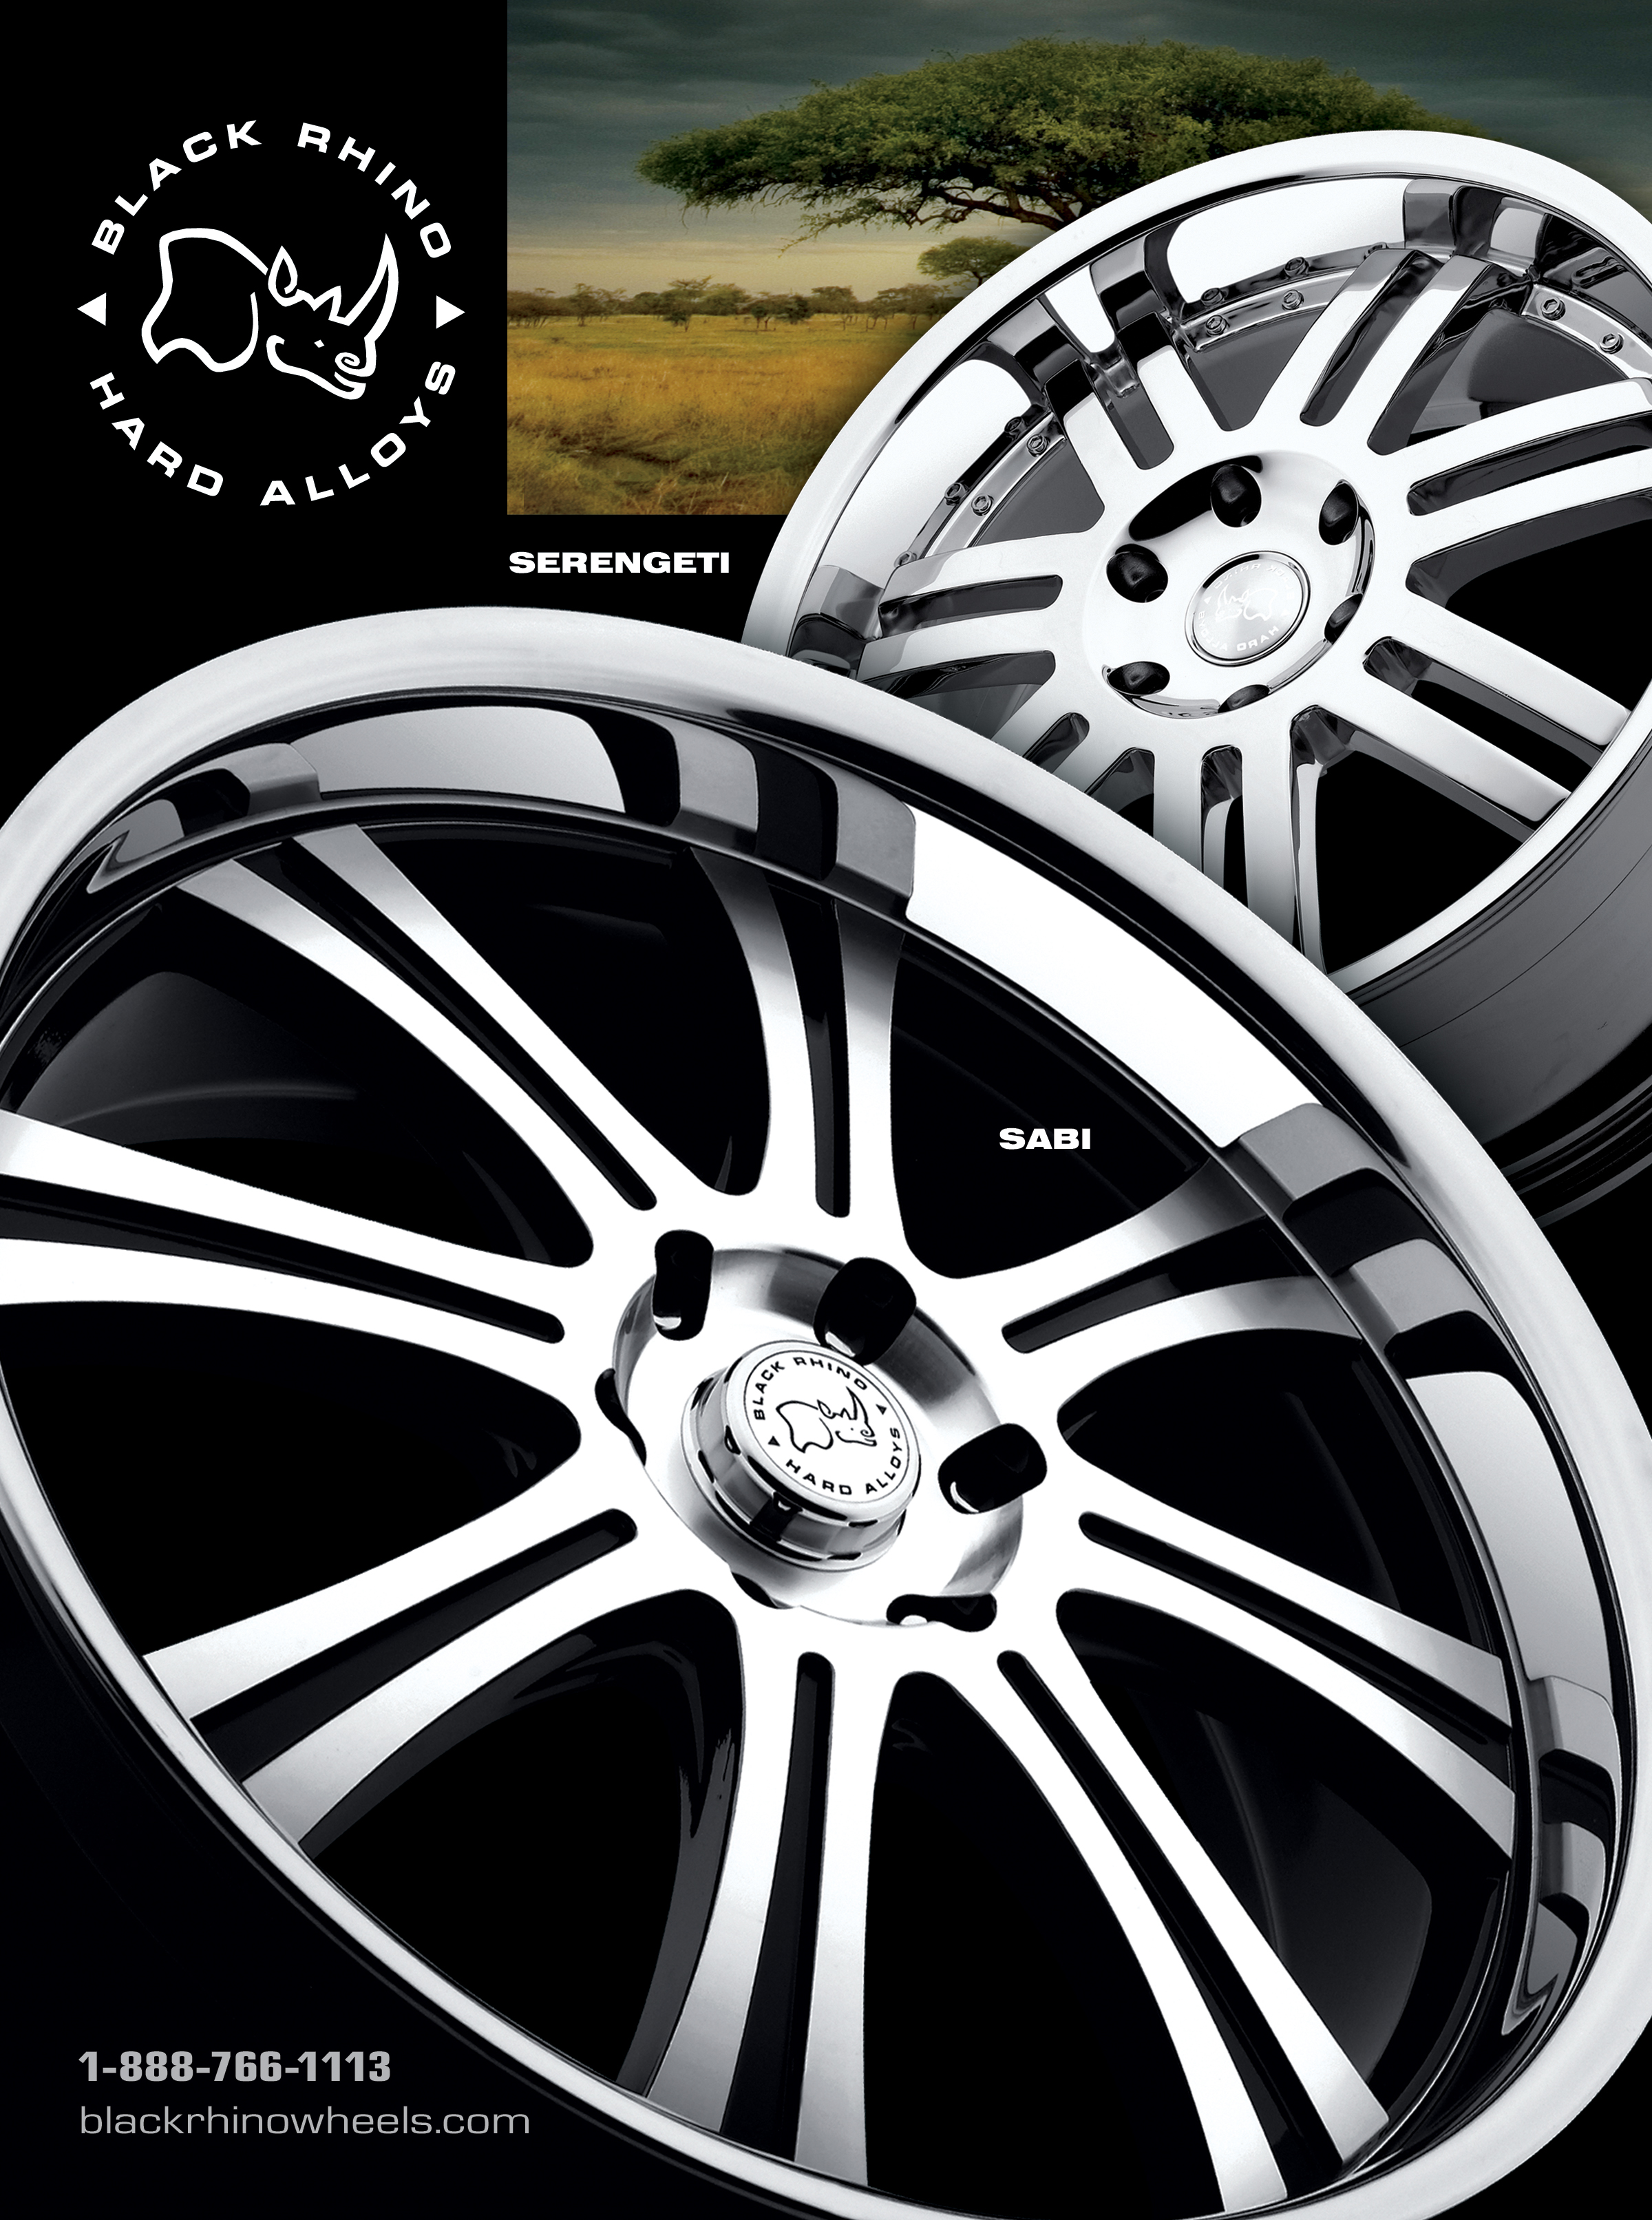 Black Rhino Introduces Sabi Alloy Wheel for Trucks and SUVs